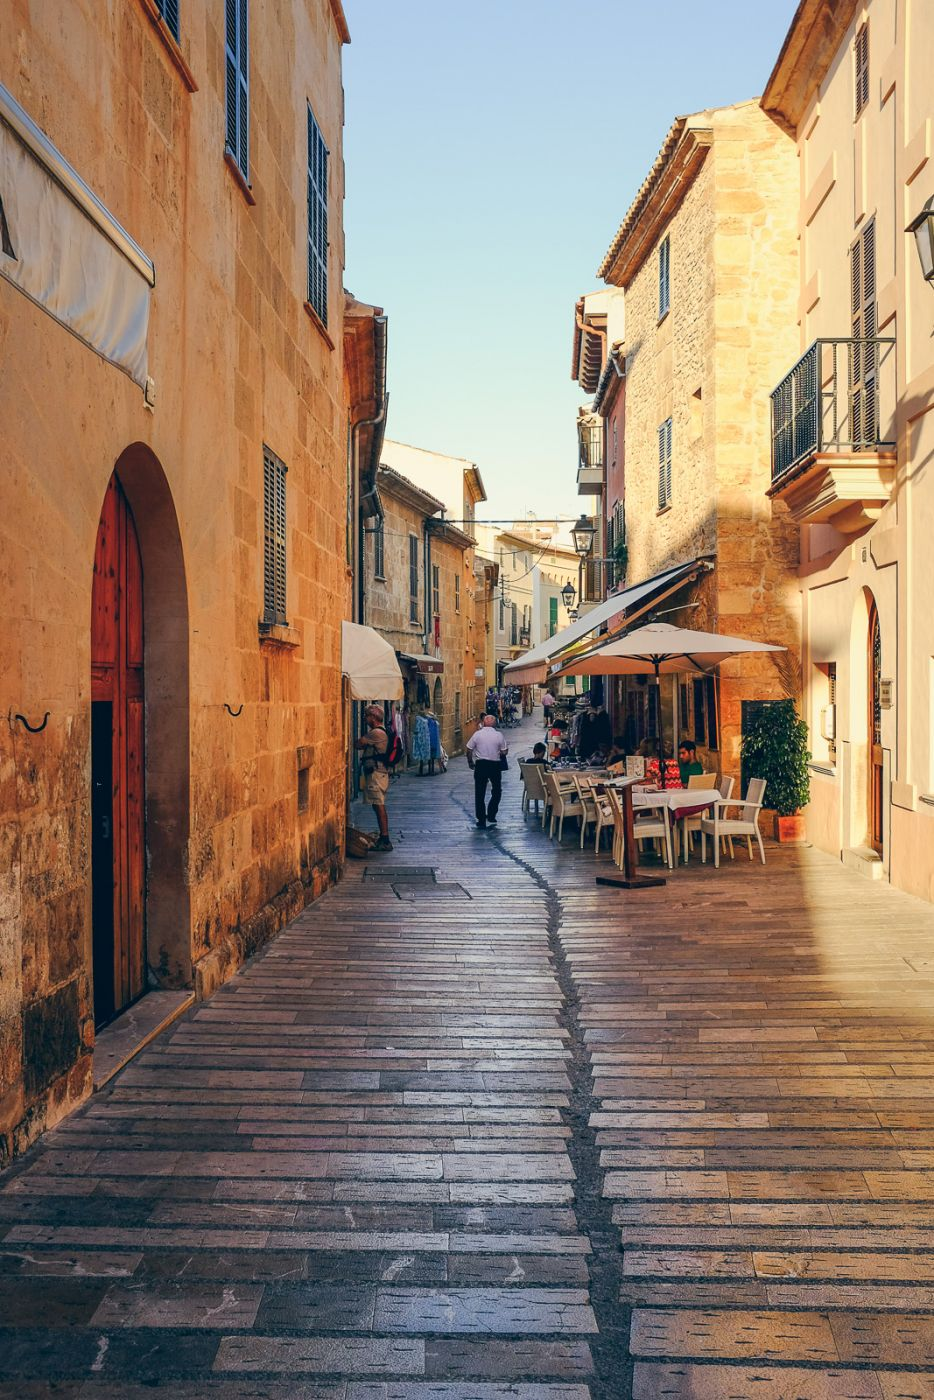 Streets of Alcúdia, Spain